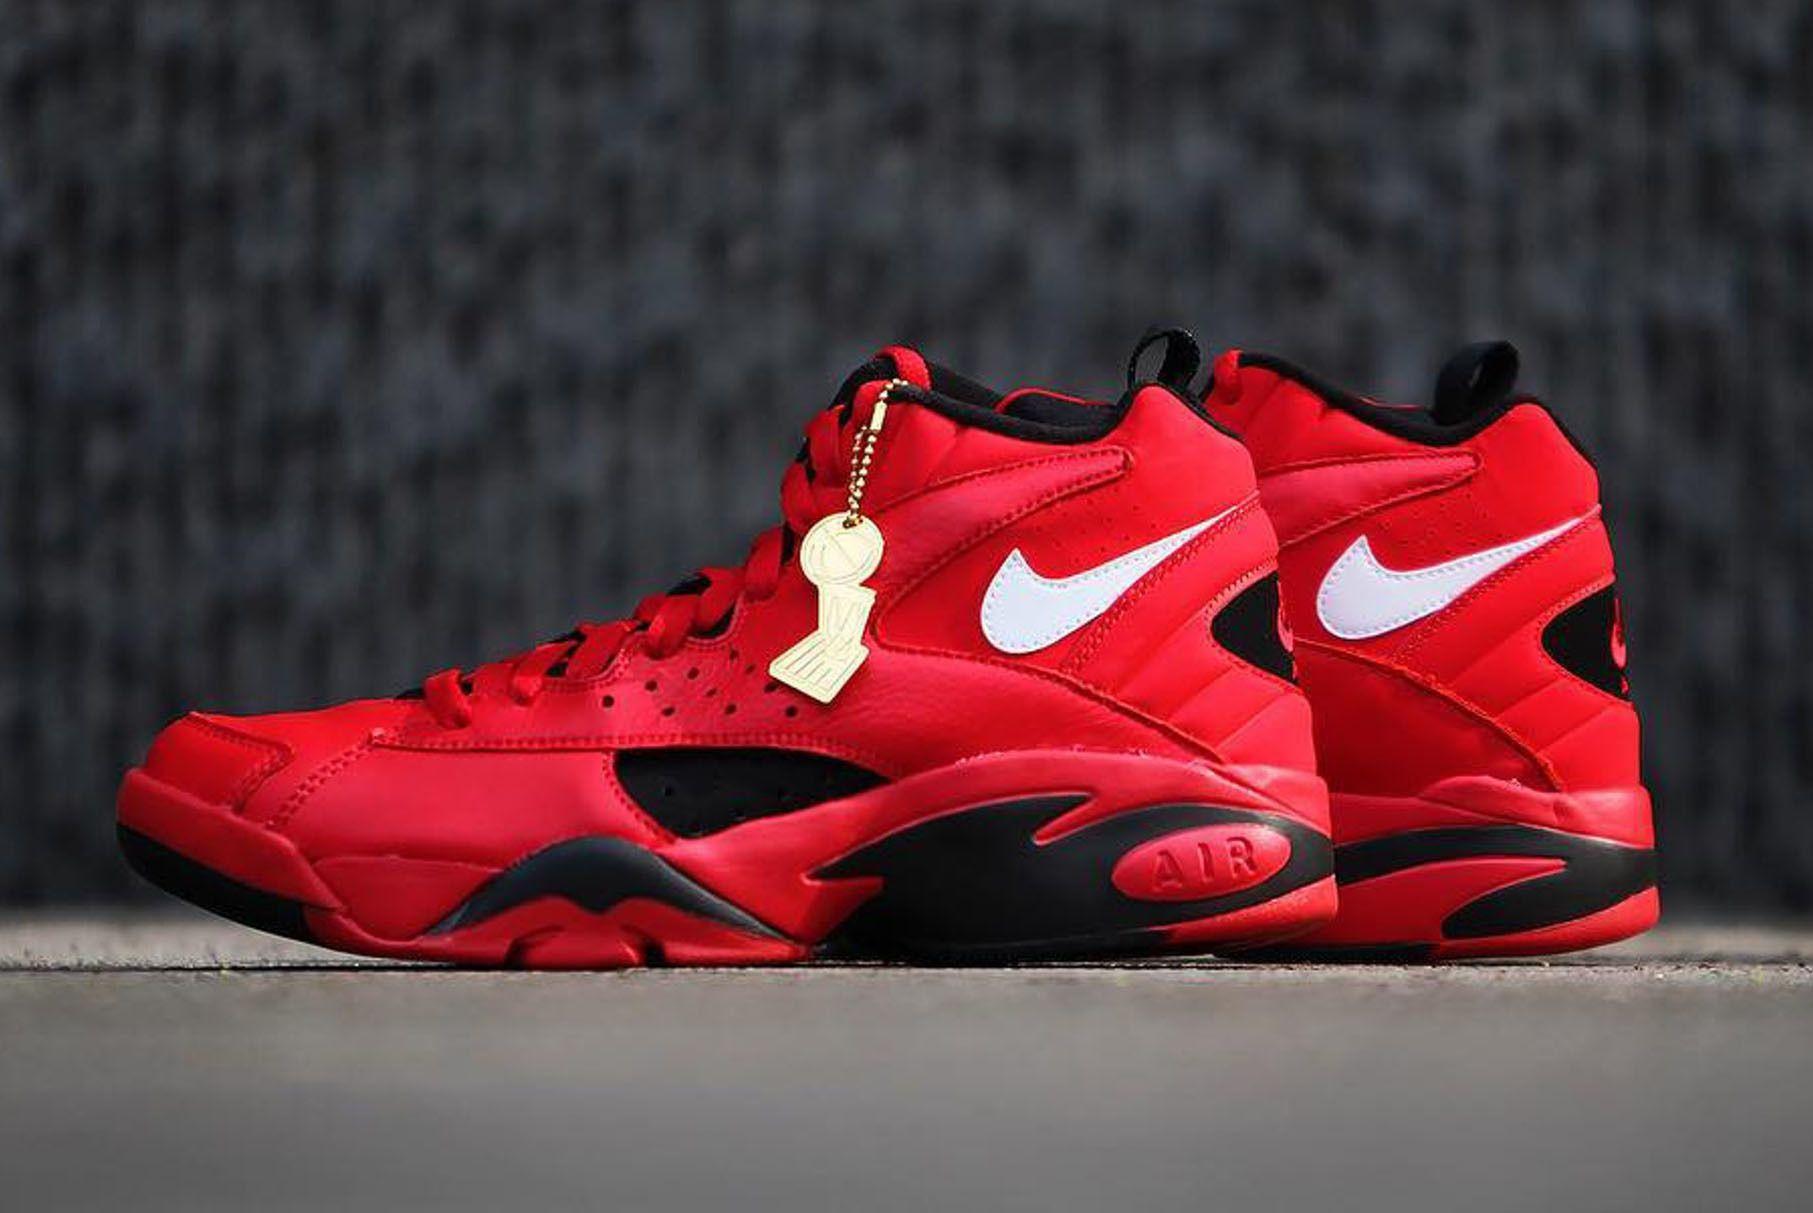 Nike Air Maestro Ii Trifecta Release Date 1 Sneaker Freaker